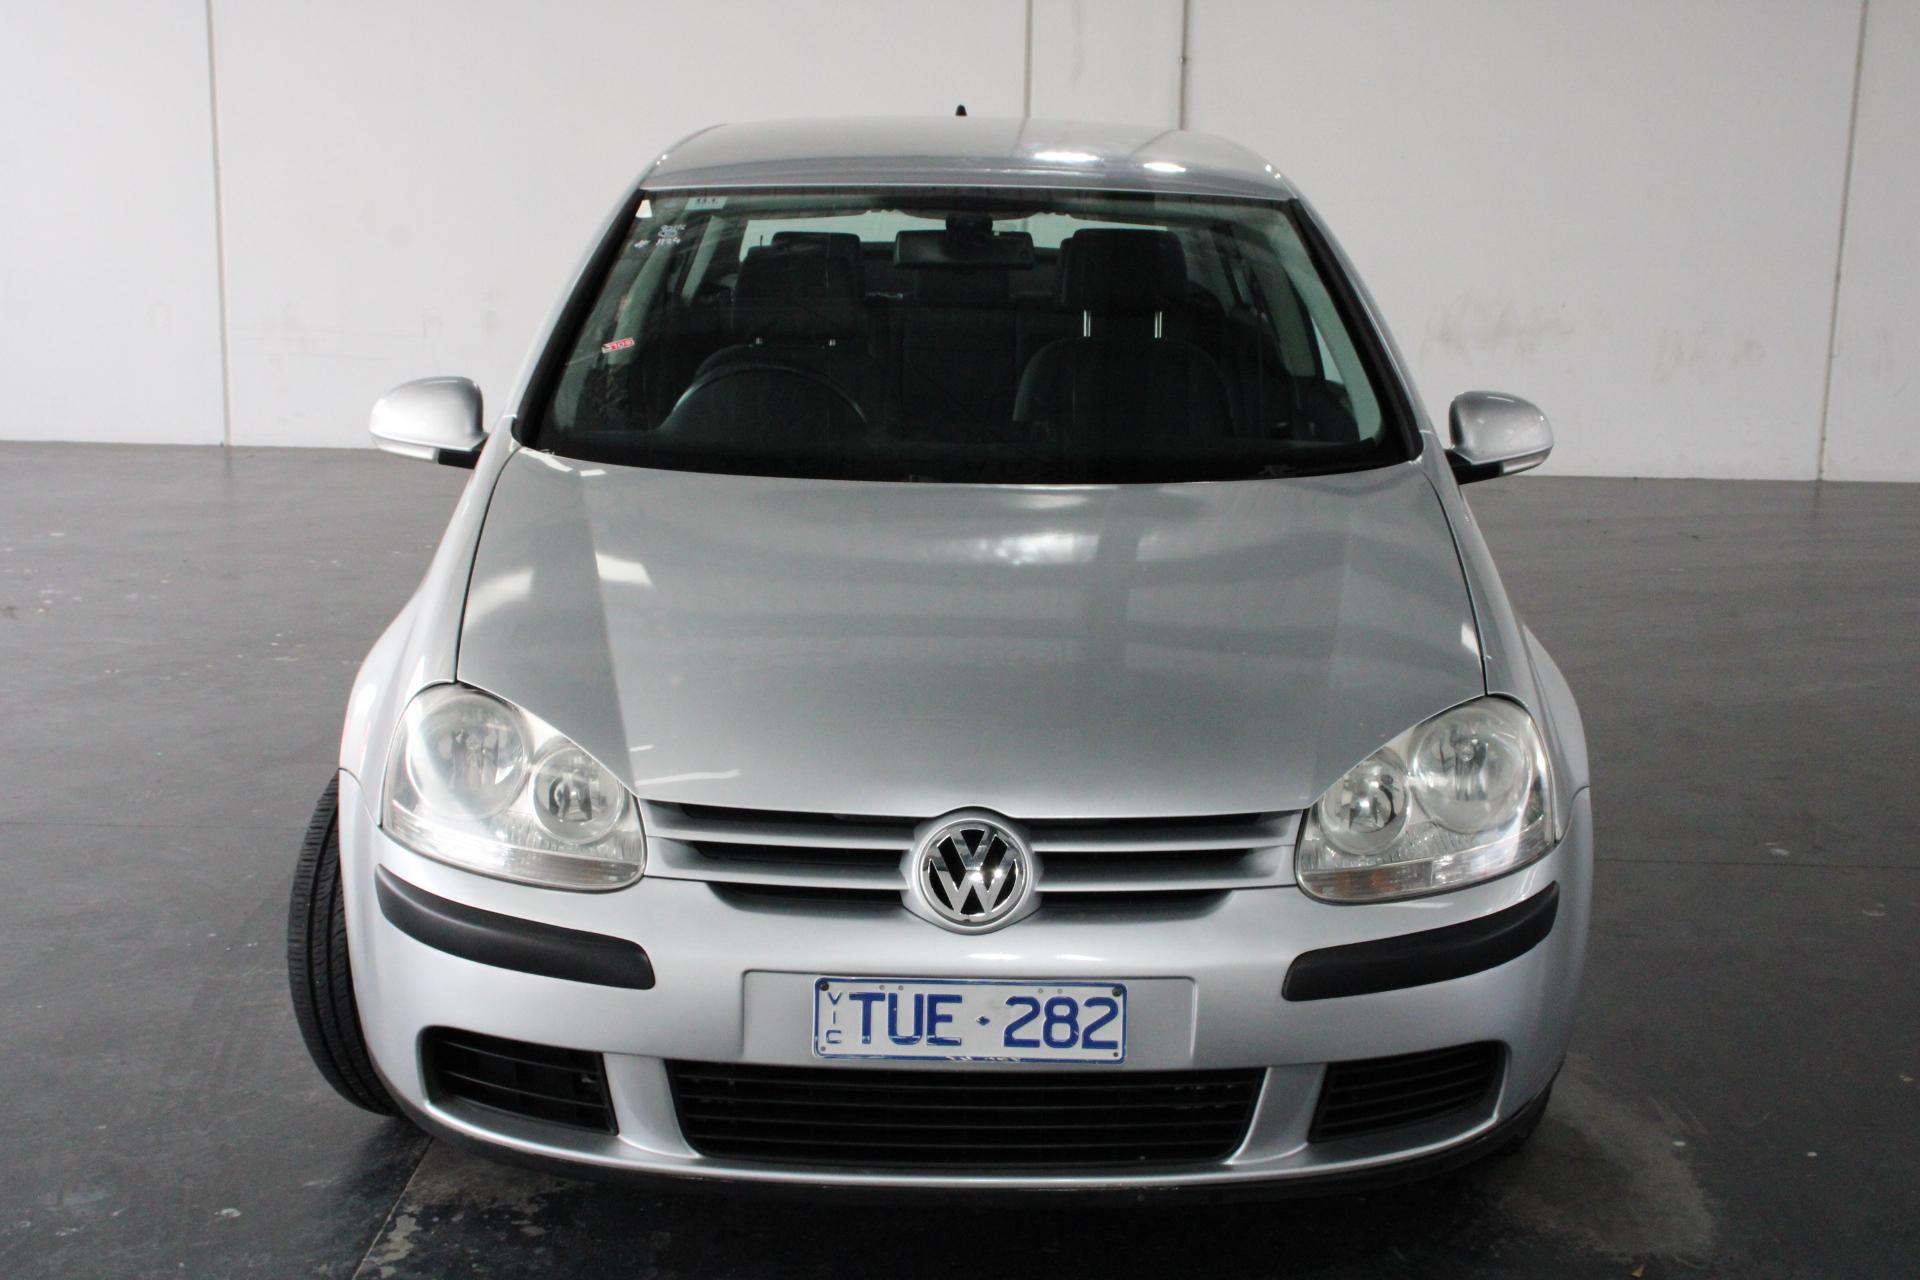 2005 Volkswagen Golf 2.0 TDI Comfortline 1k T/D Automatic Hatchback